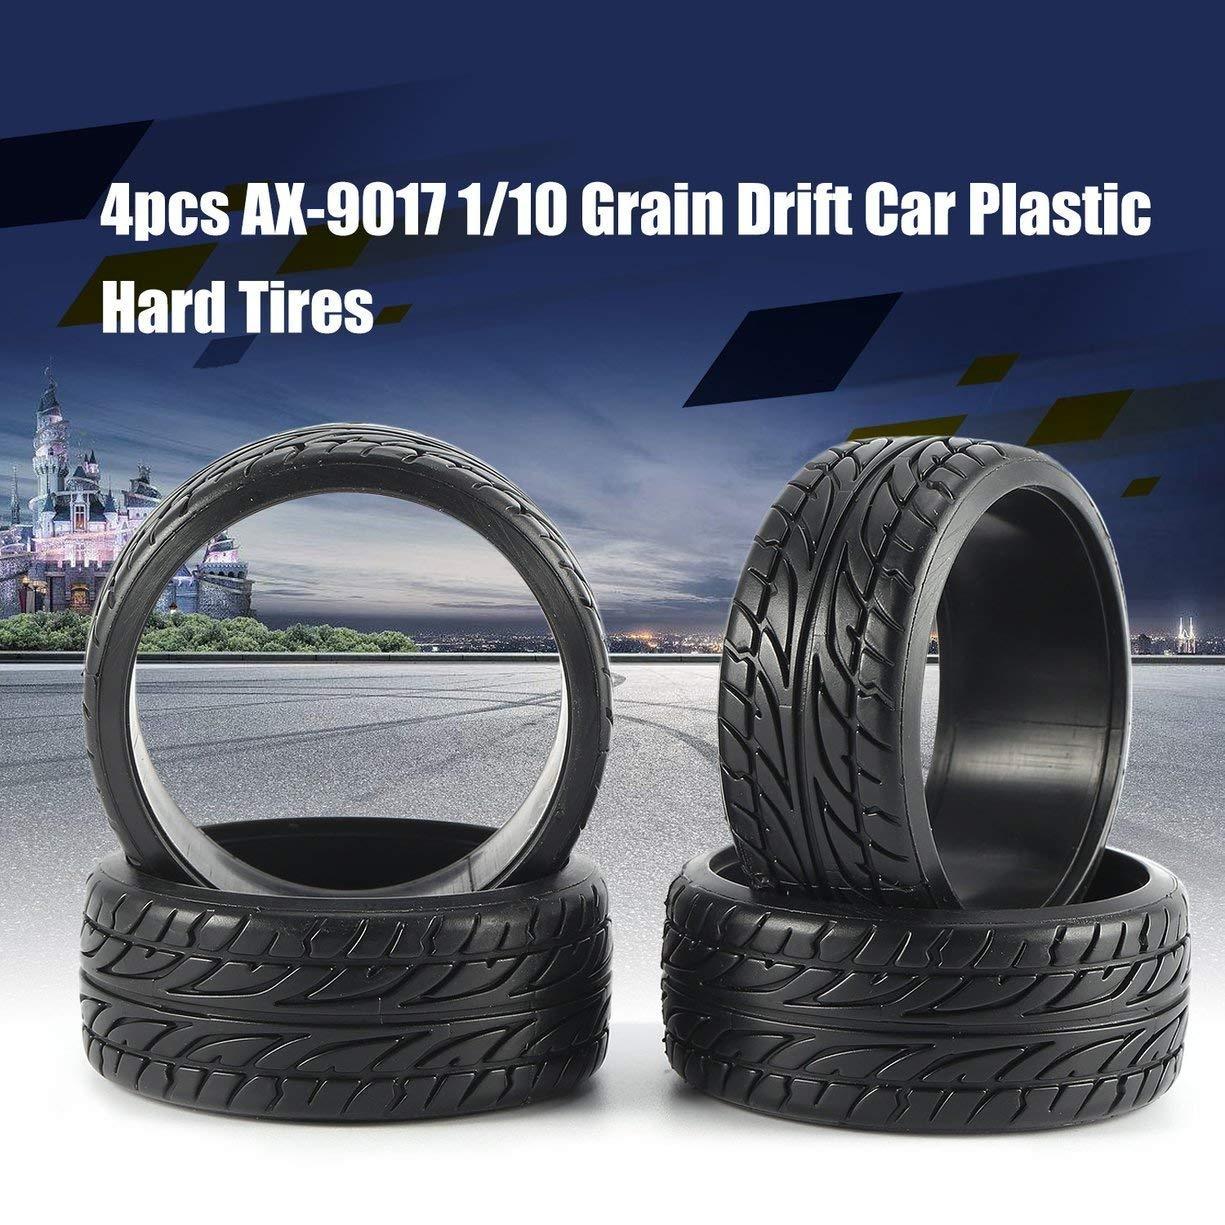 Shaluoman Rc Car Drift Tires Tyre And Wheels 10 Spoke Black For Hsp Hpi